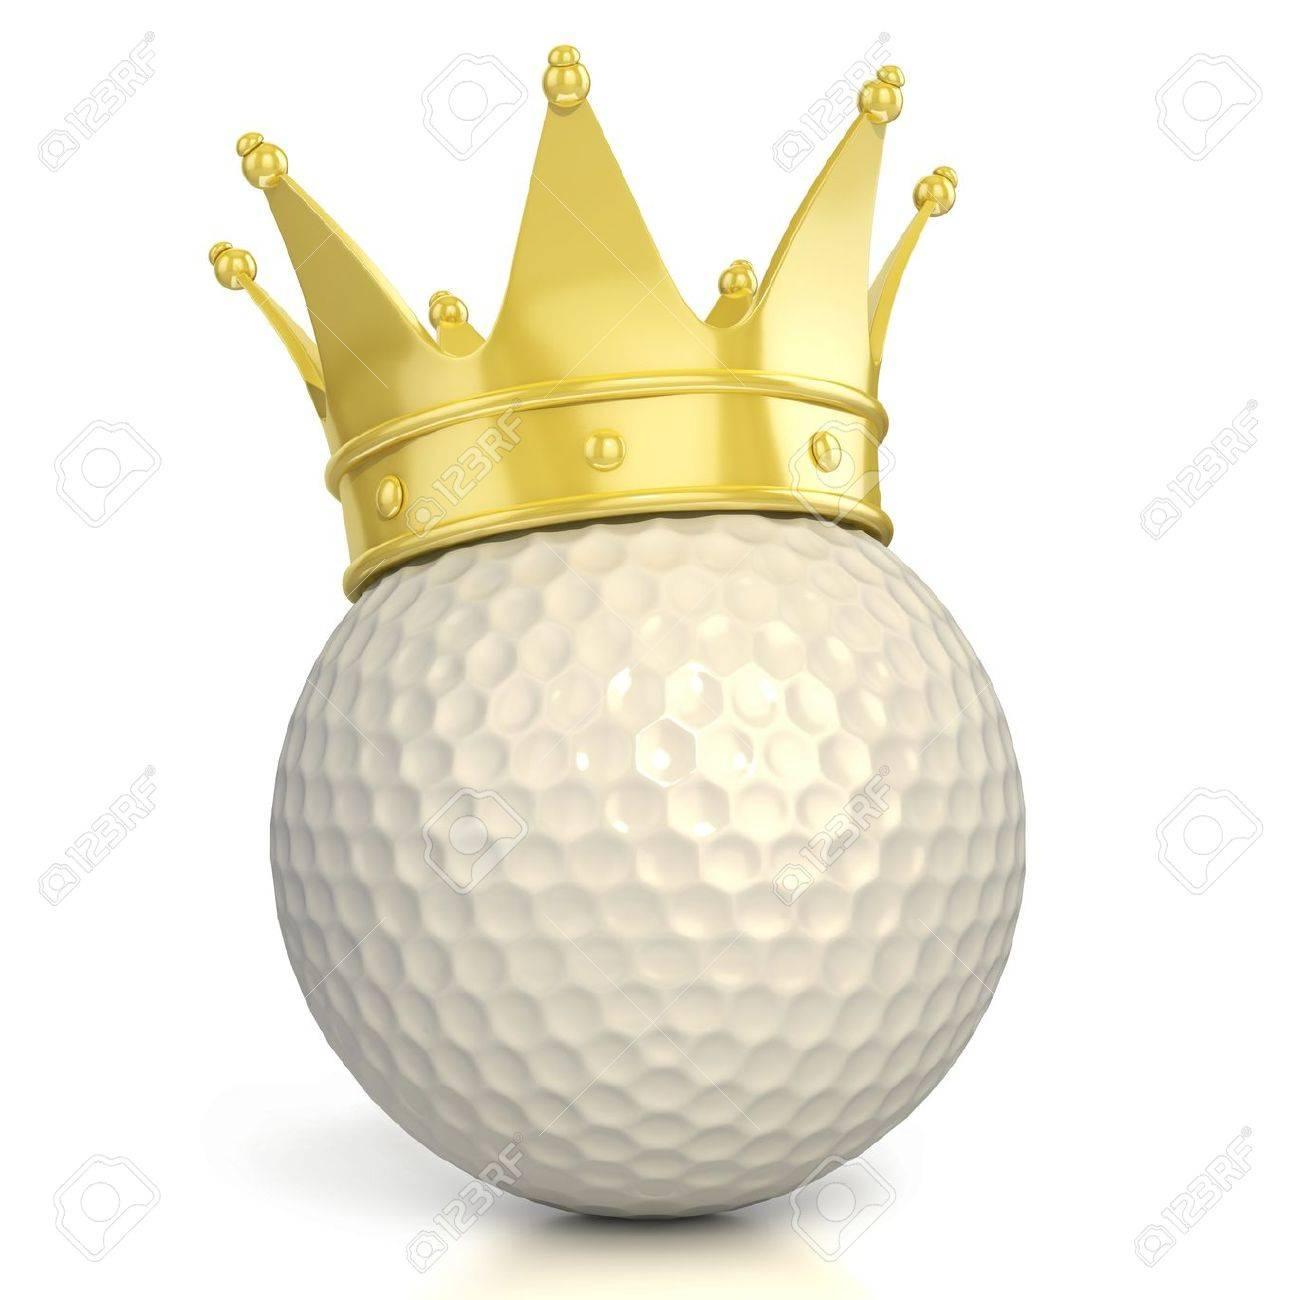 golden golf ball stock photos royalty free golden golf ball